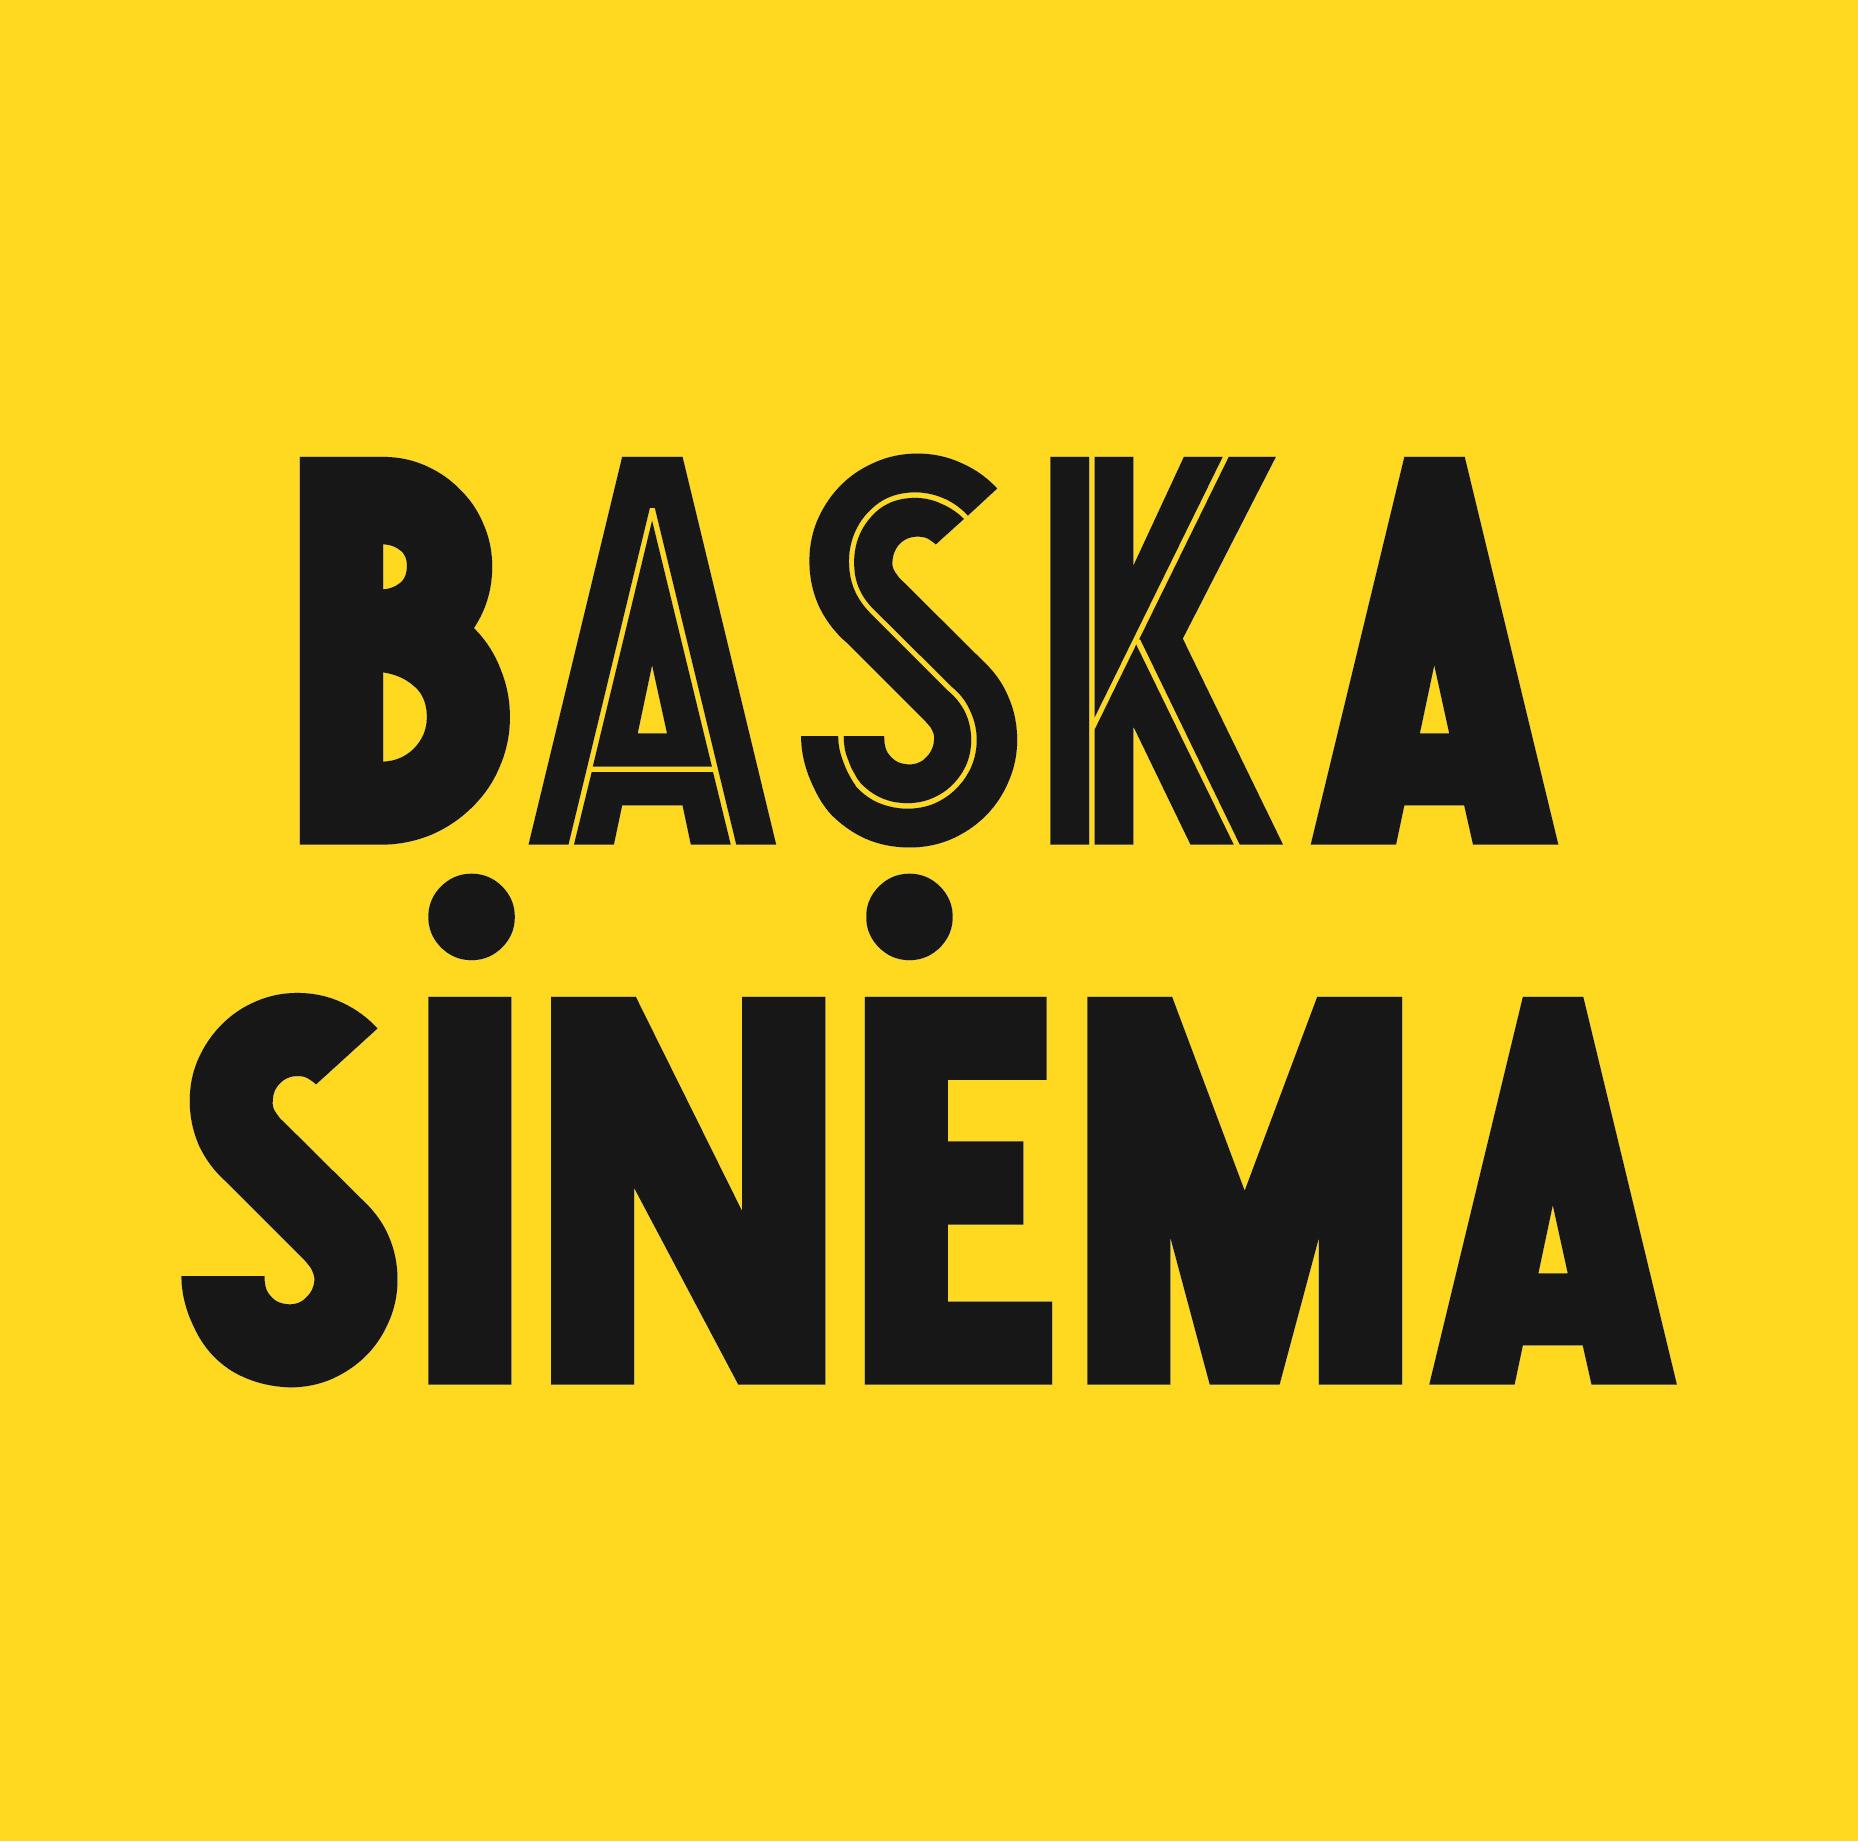 BASKASINEMA_LOGOTYPE-11.png